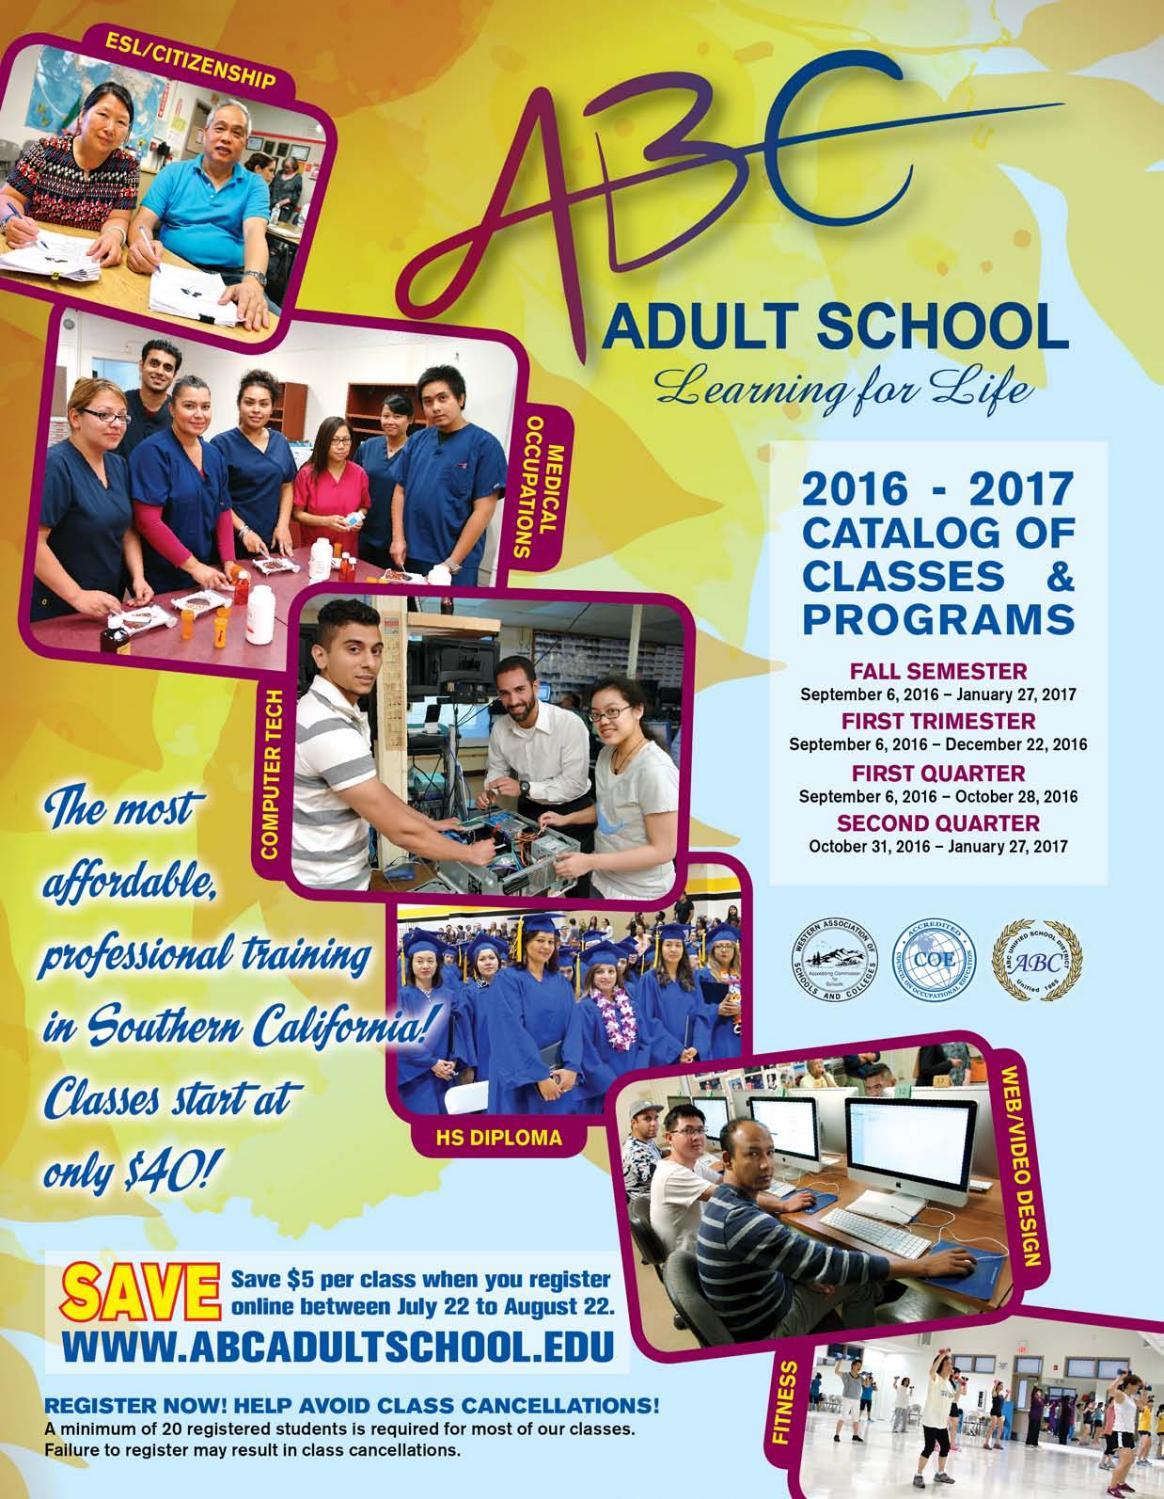 abc adult school fall 2016 catalog of classes by q press